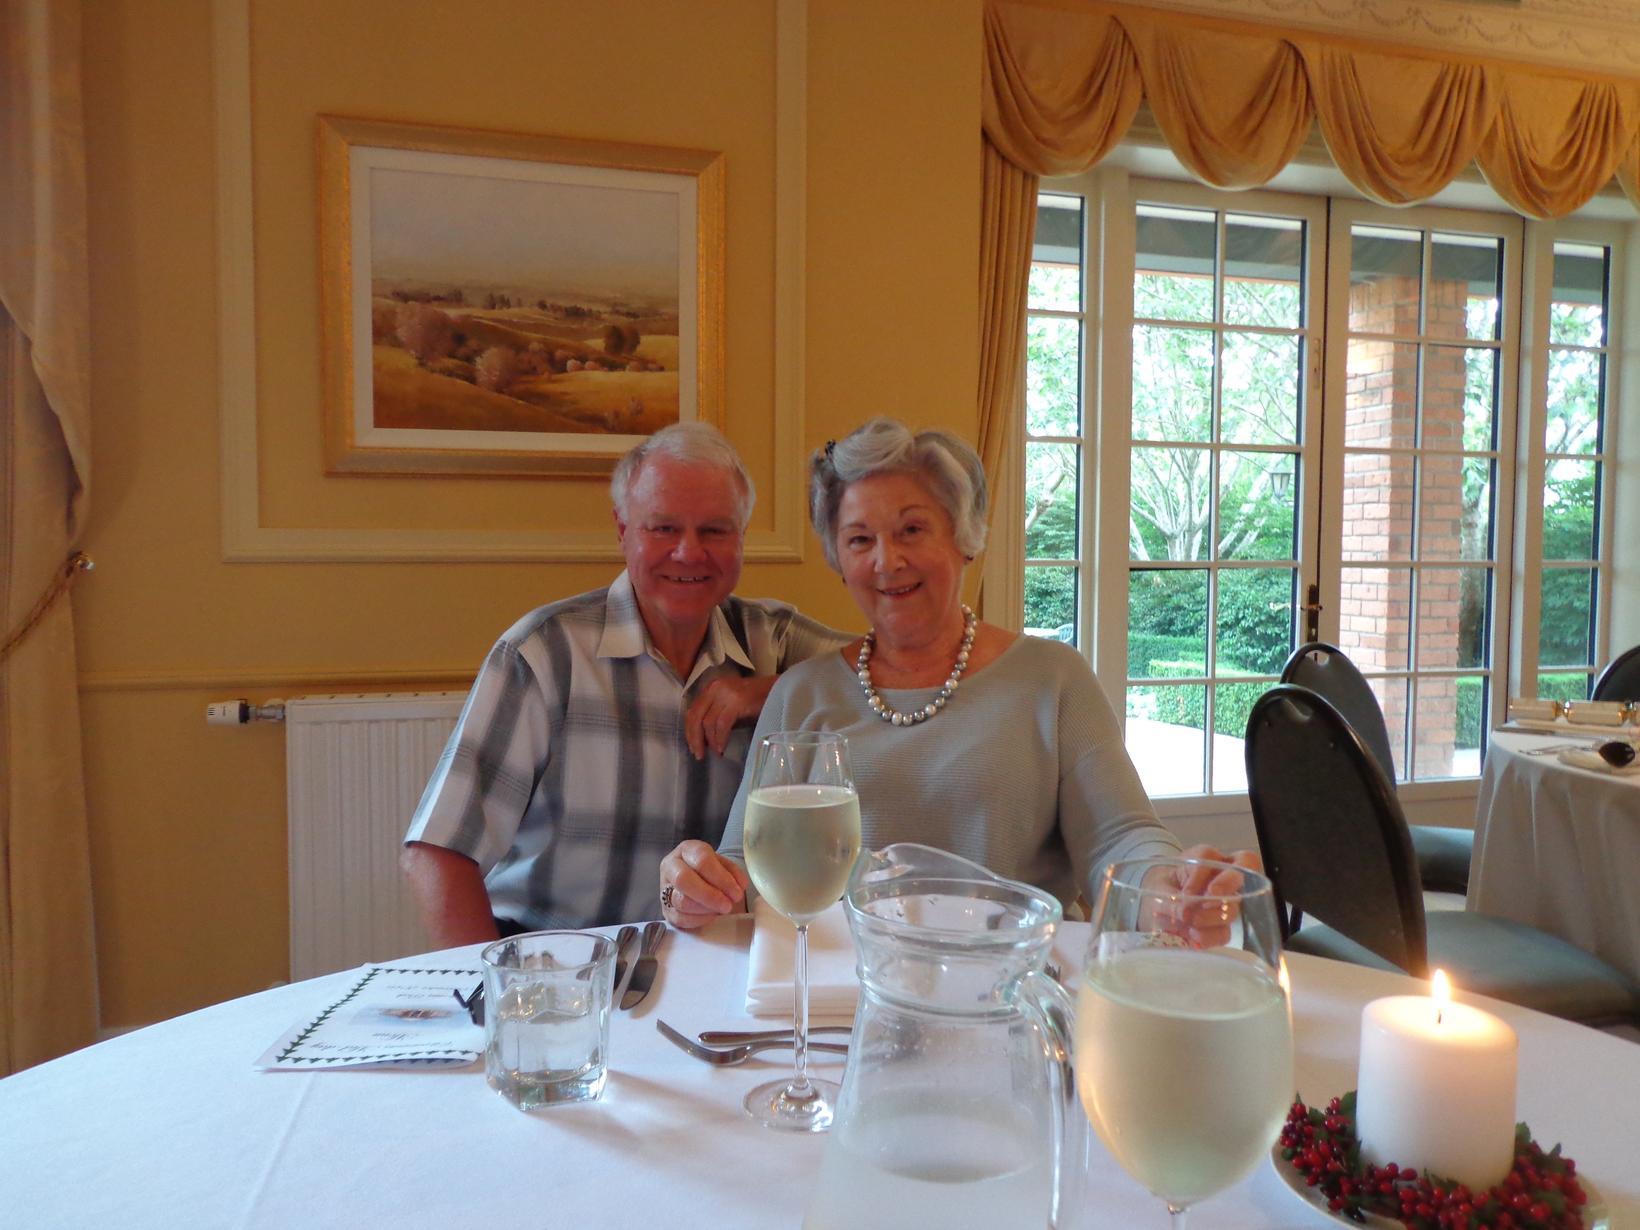 Bill & Dianne from Tauranga, New Zealand